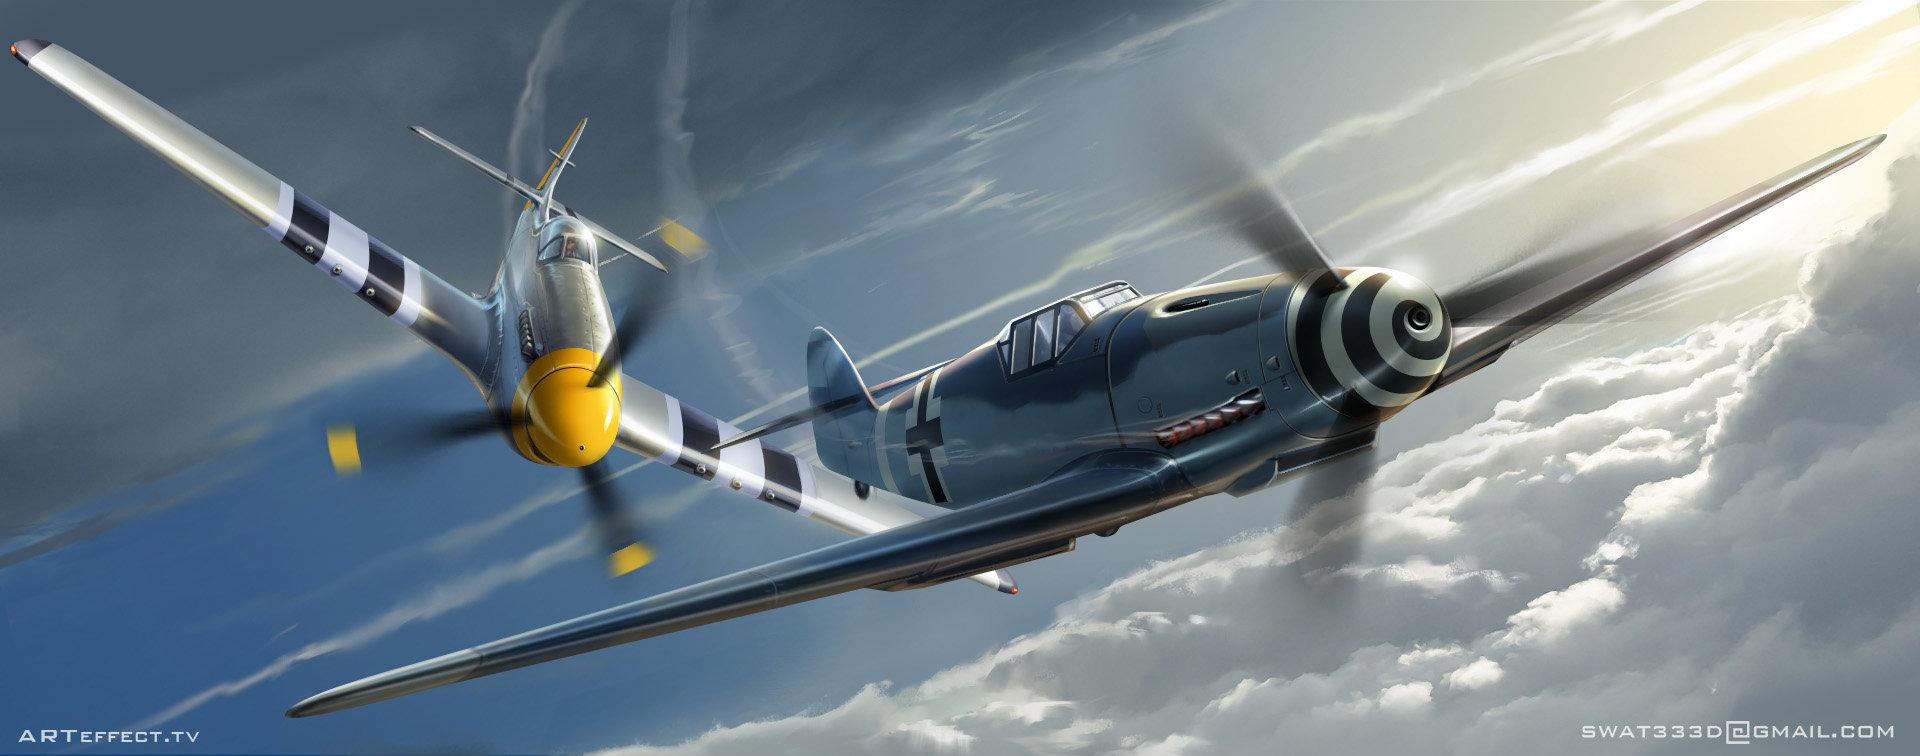 Sviatoslav gerasimchuk plane fighters